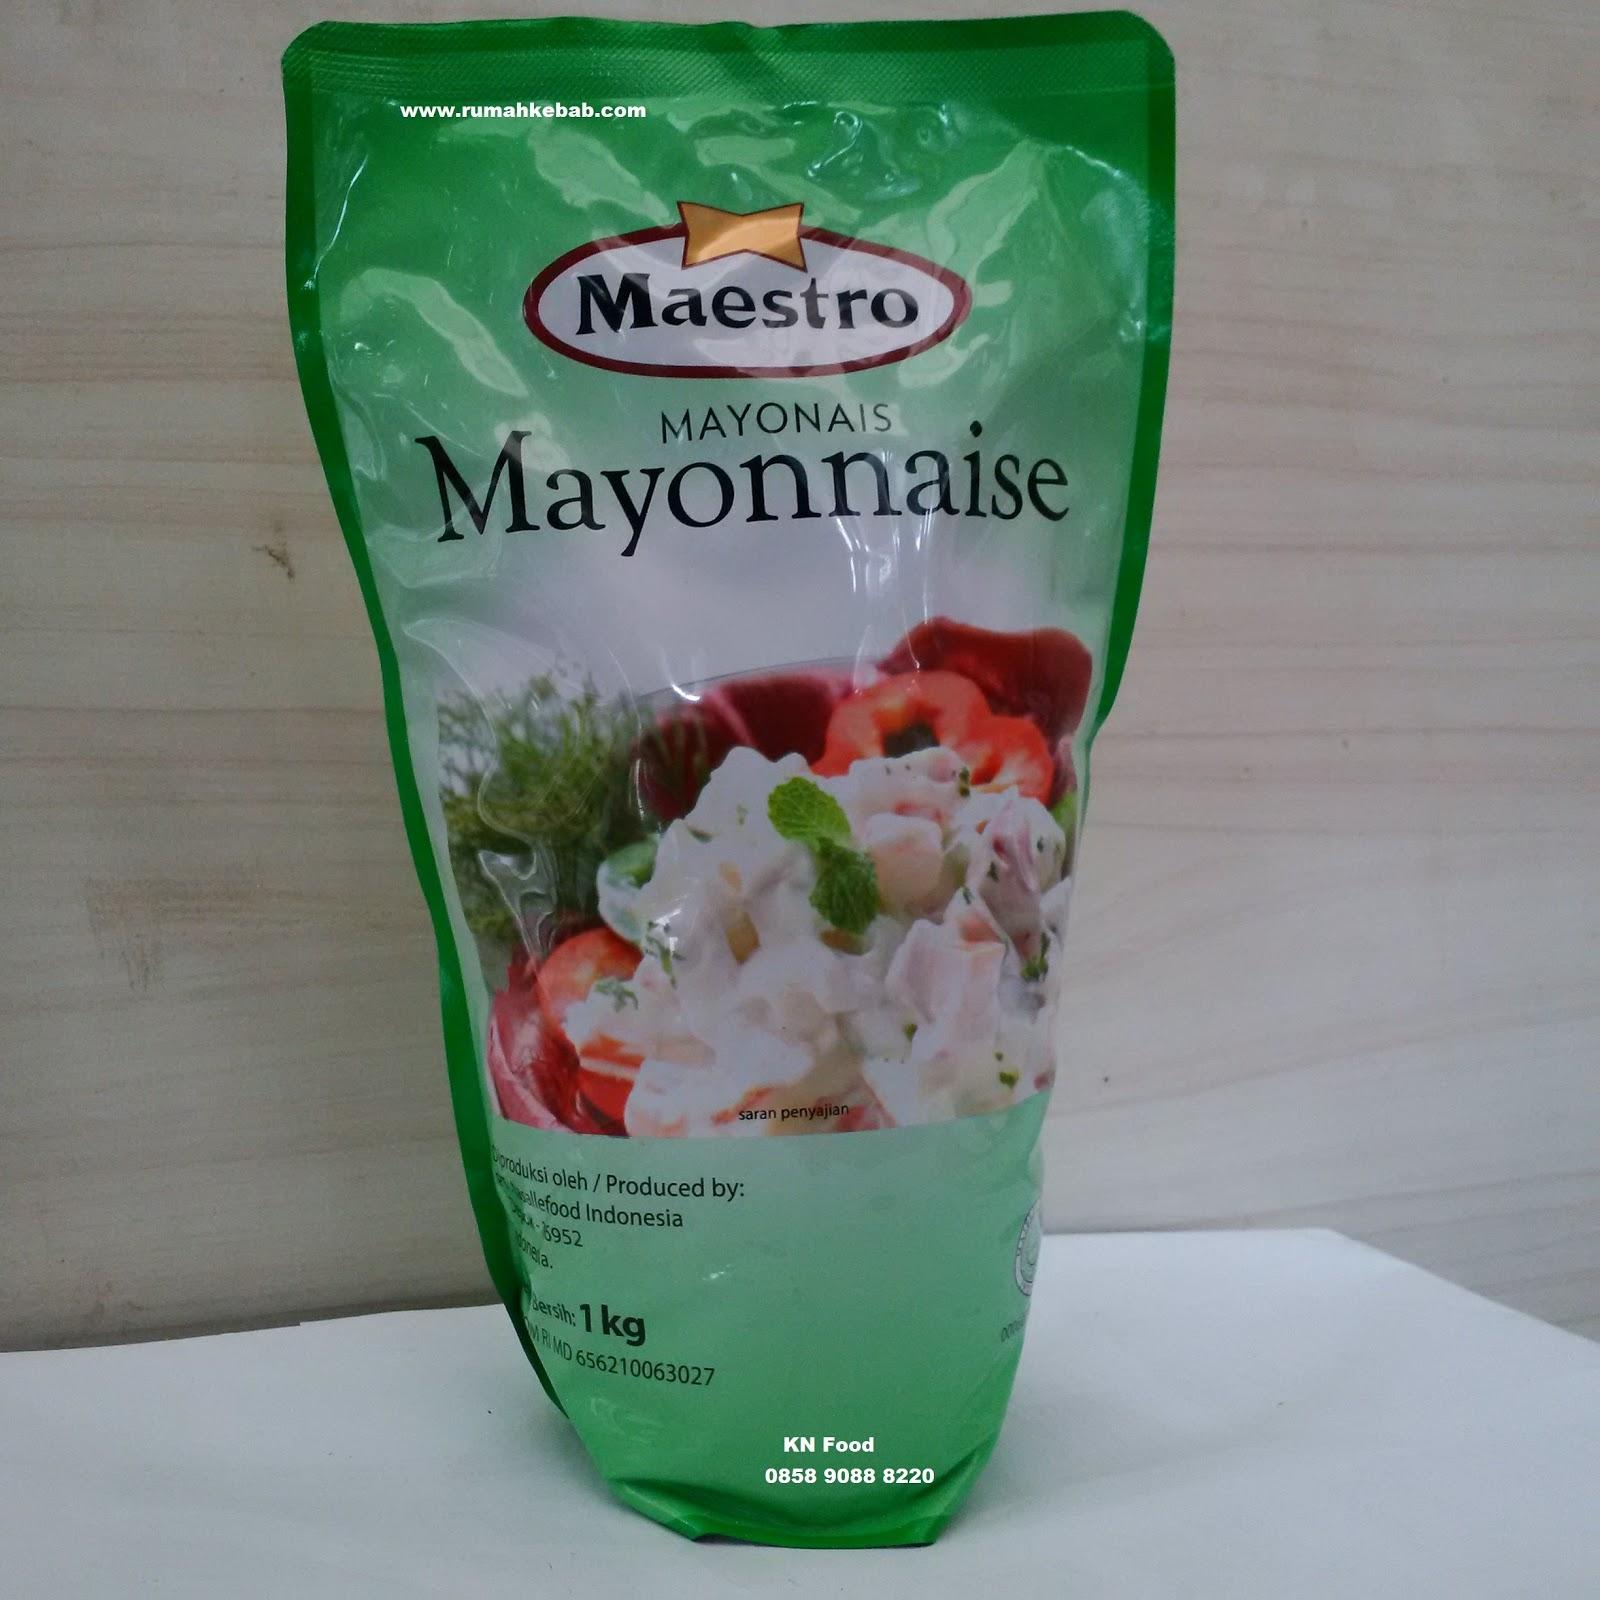 10 Rekomendasi Mayonnaise Terbaik (Terbaru Tahun 2019)